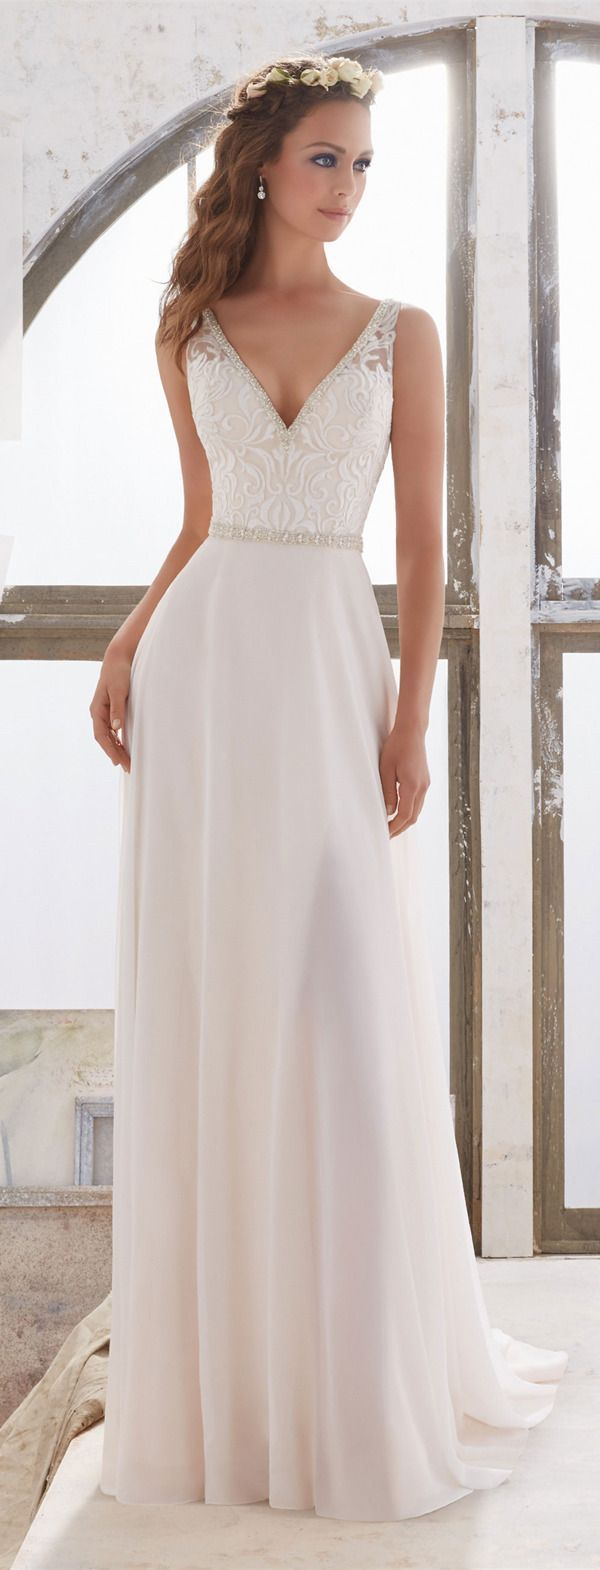 Simple Elegant Wedding Dress - Dresses for Wedding Party Check more at http://svesty.com/simple-elegant-wedding-dress/